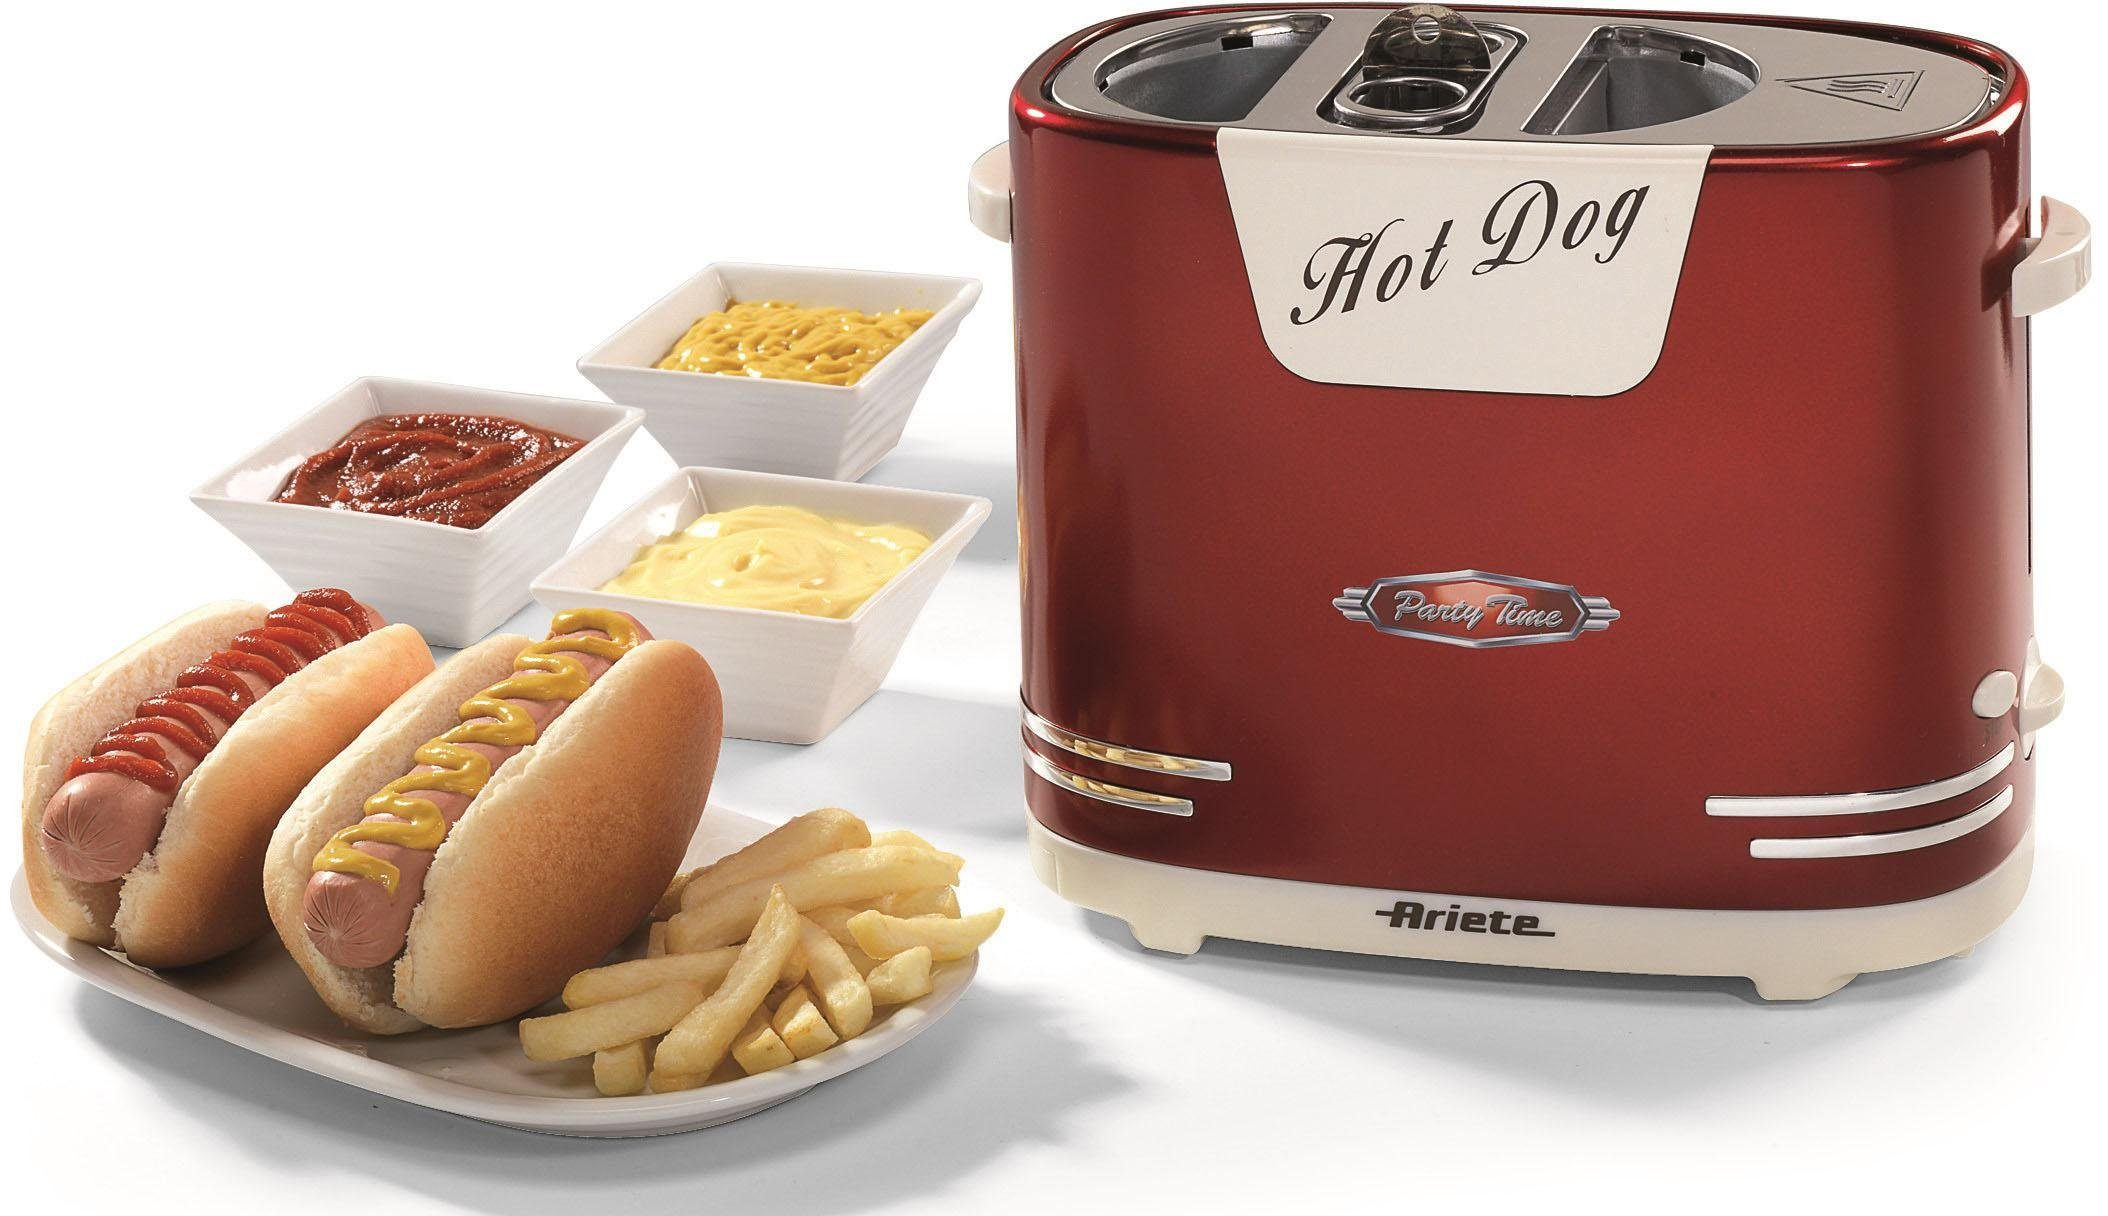 Ariete Hotdog-Maker 186 Party Time, 650 W